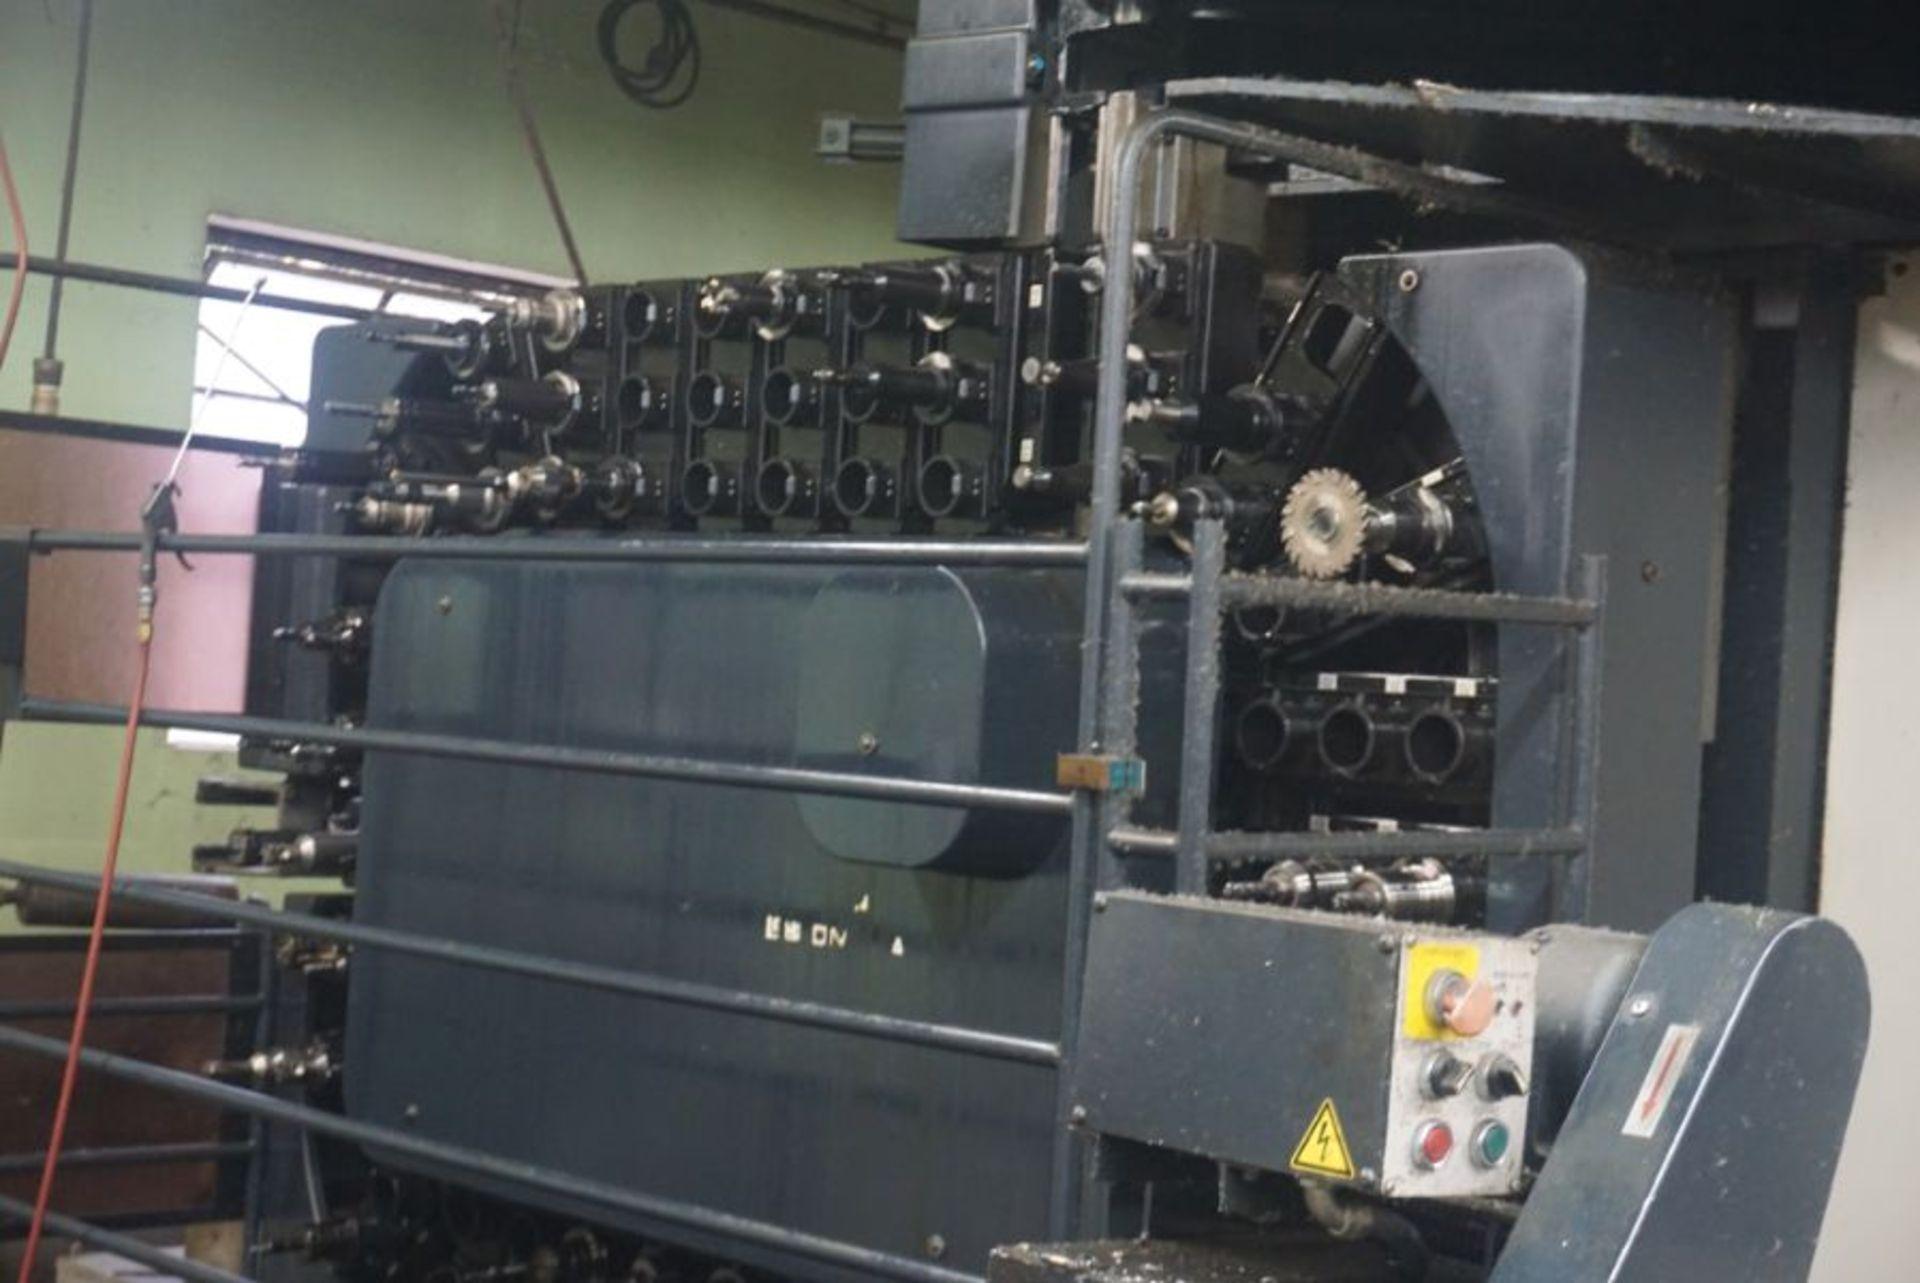 Makino MC98-A99 4-Axis Horizontal Machining Center, Fanuc 16 Pro 3 Control, New 1991 - Image 4 of 8